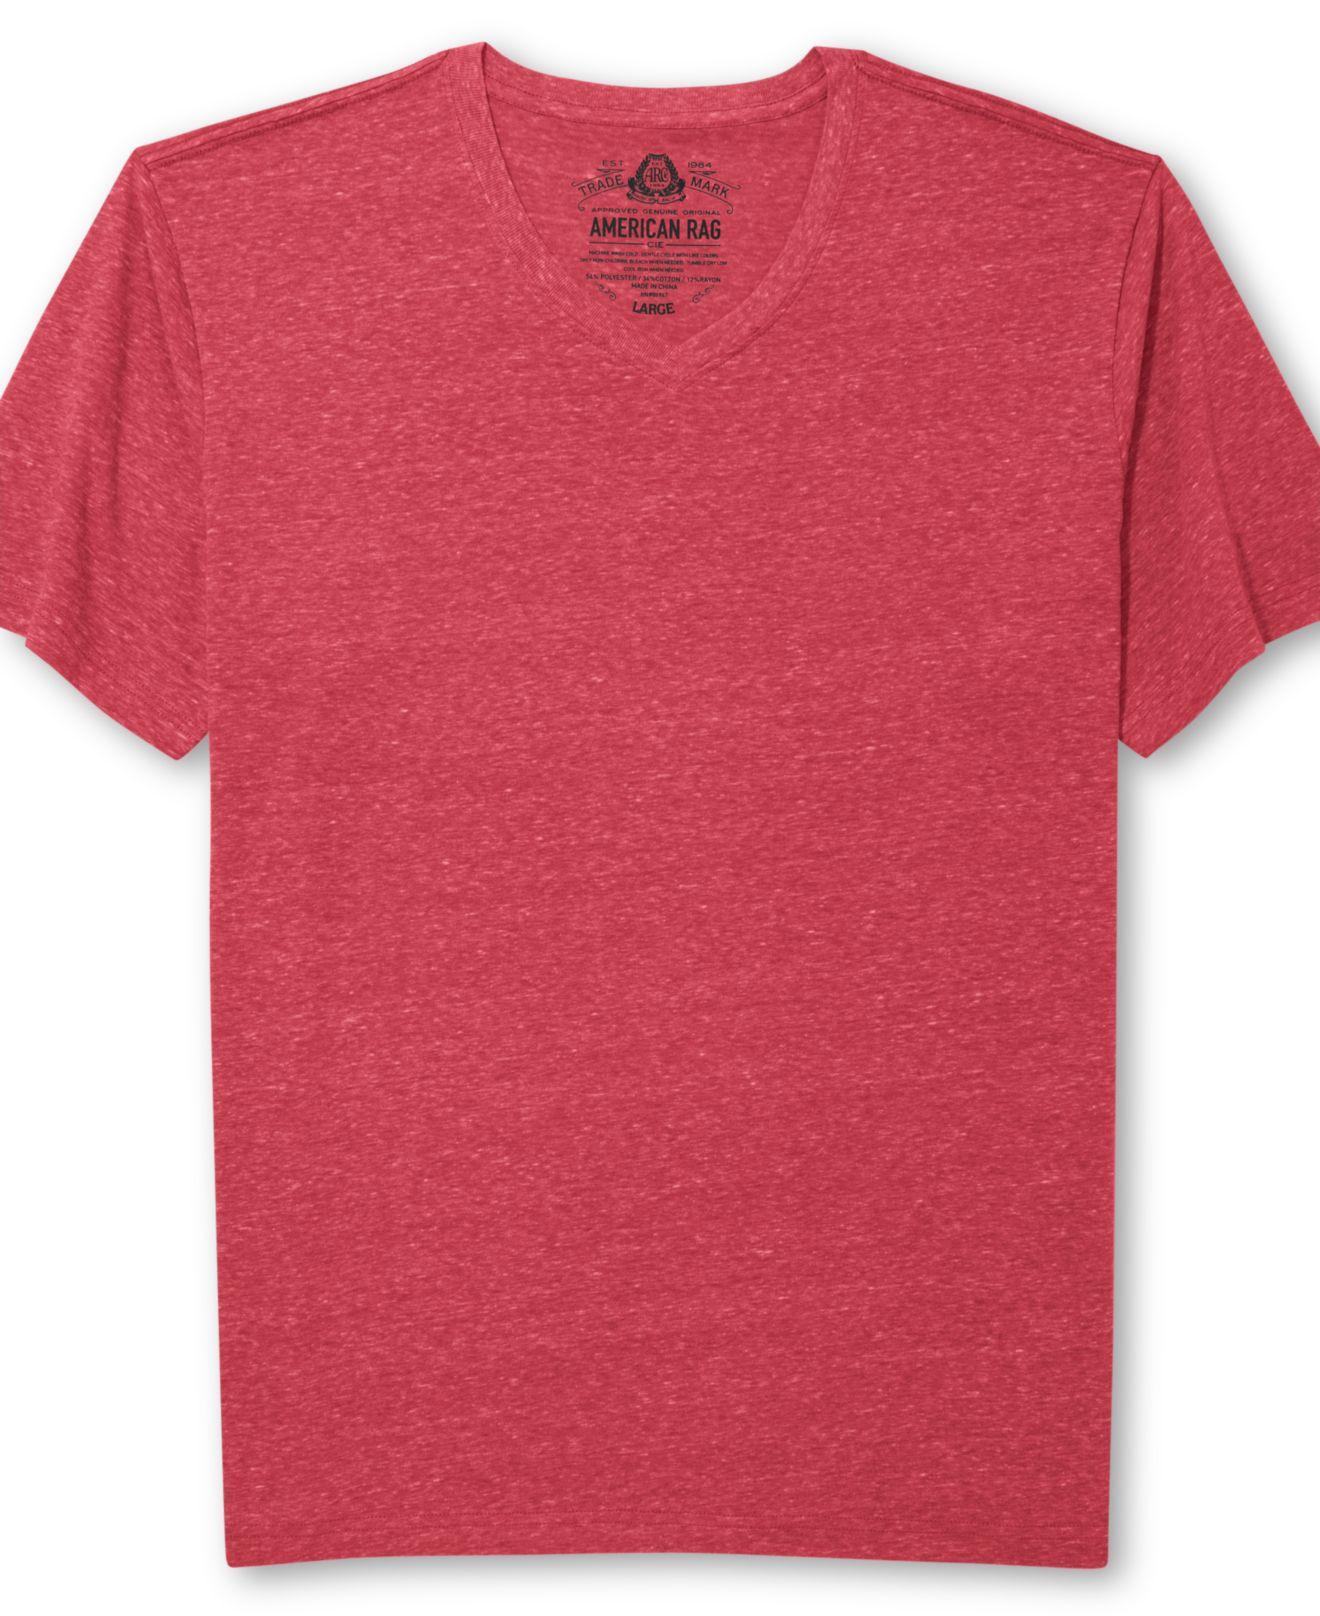 T Shirt Rag Dispenser ~ American rag solid tri blend t shirt in red for men lyst